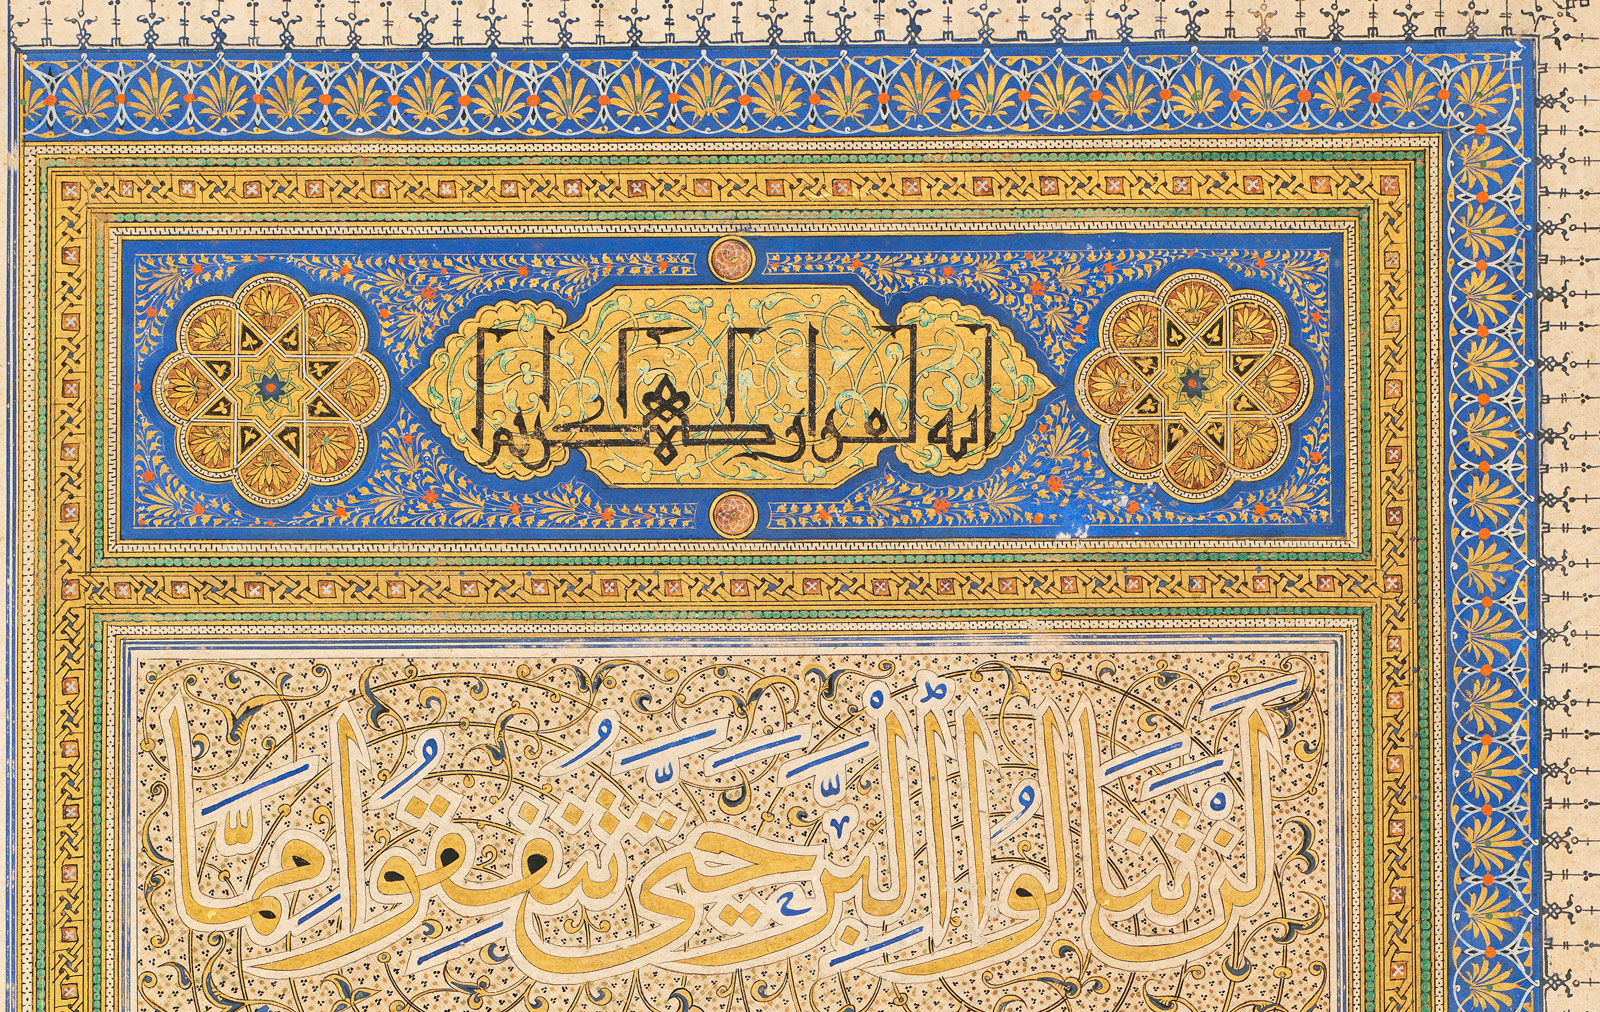 Detail from a Koran, Iran, probably Shiraz, Timurid period, 1430–1440